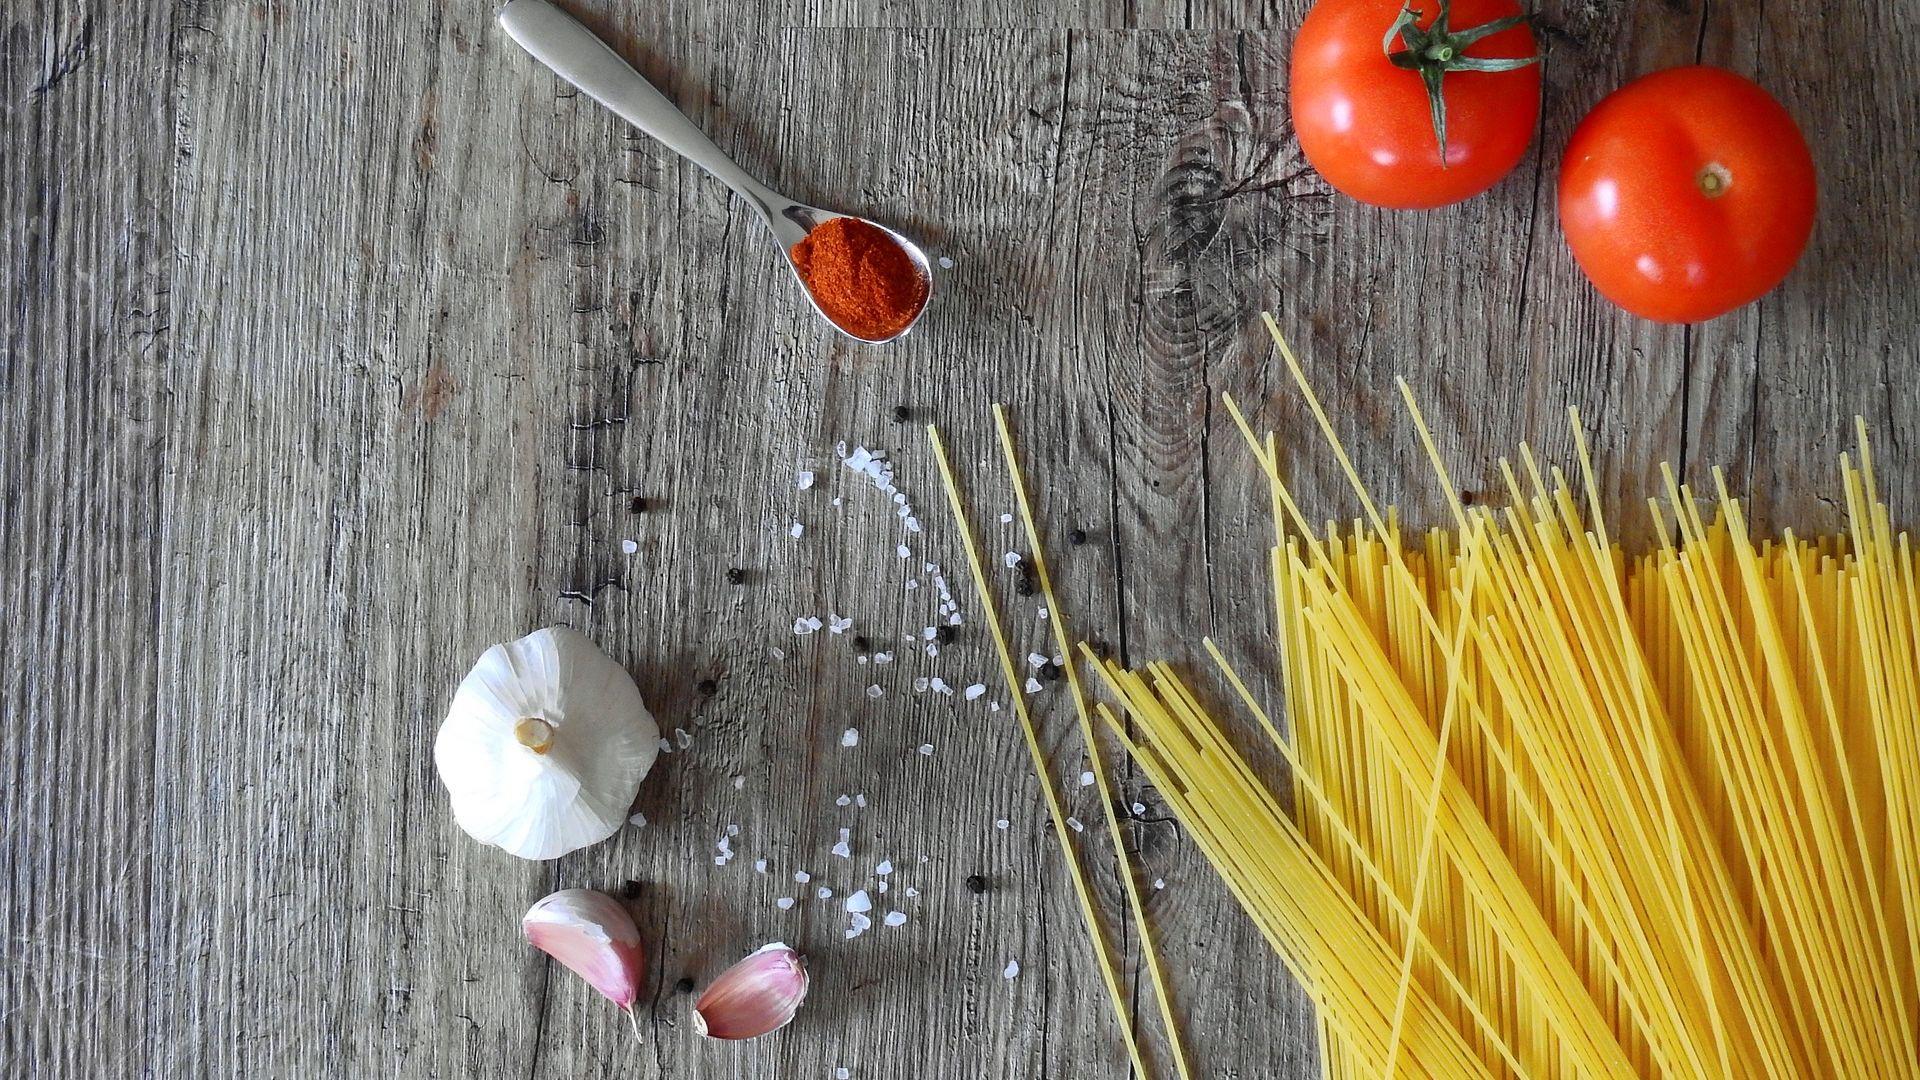 Wallpaper Tomato, spoon, dine, kitchen, food